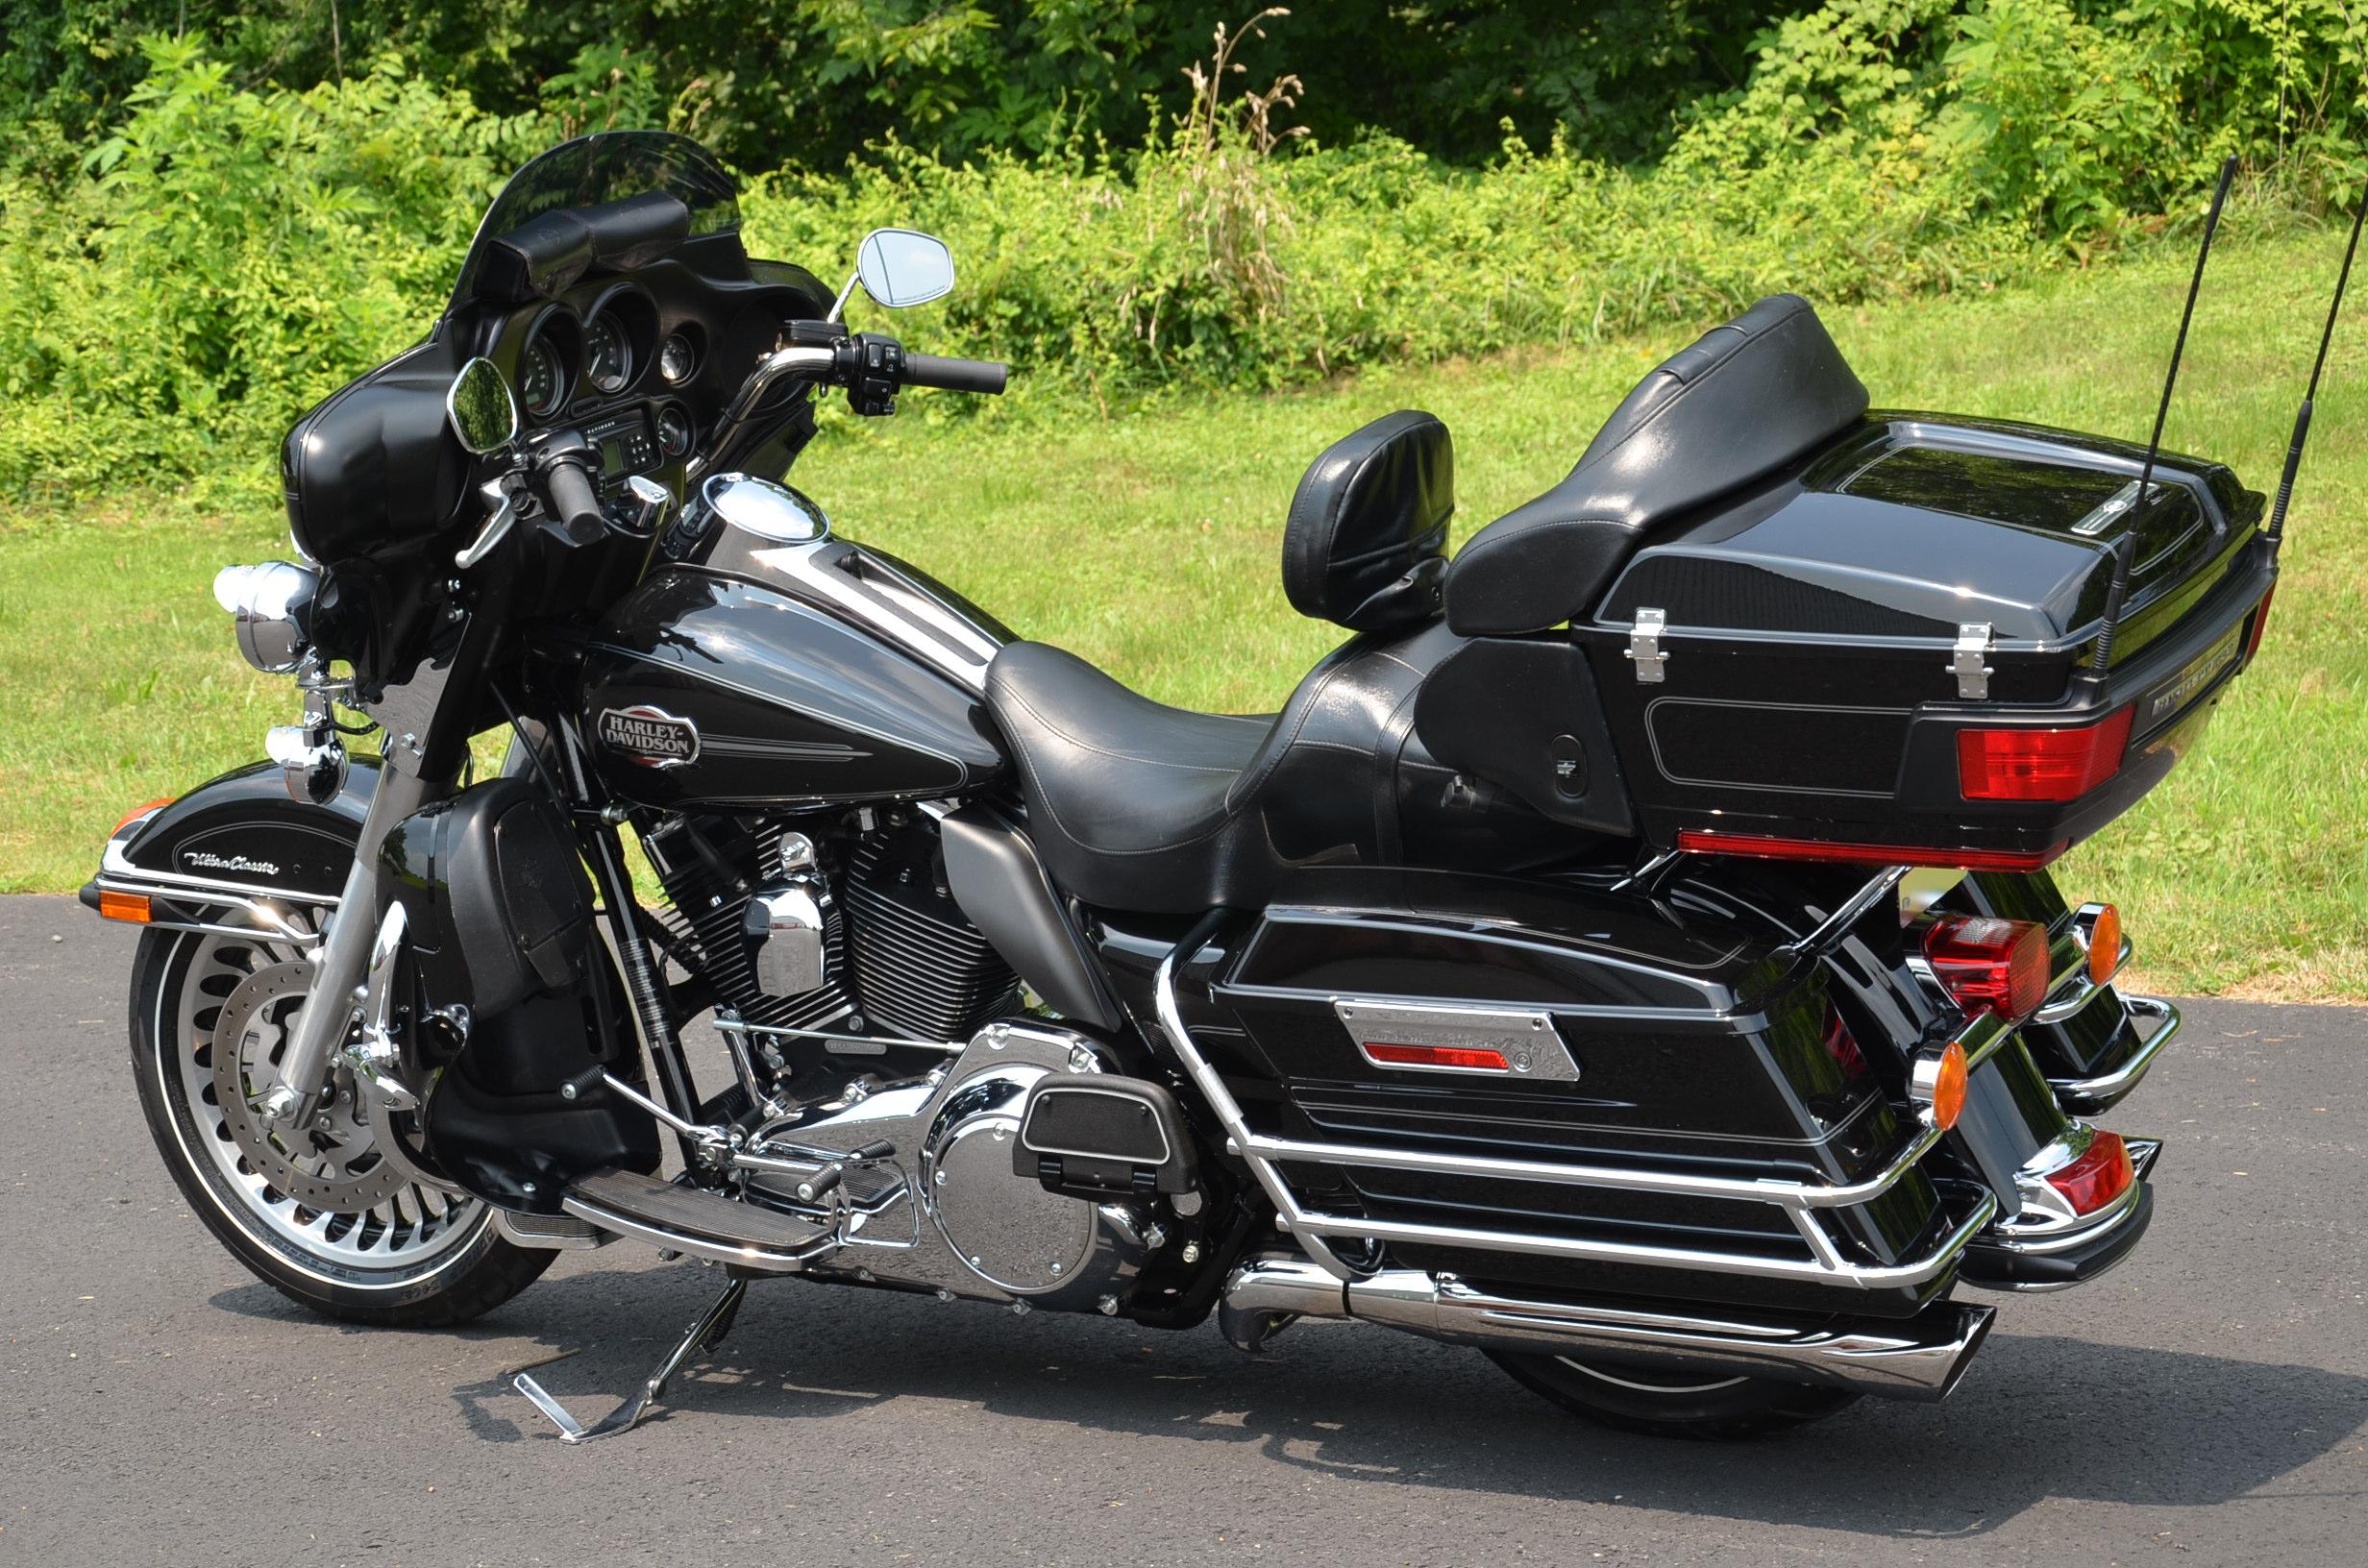 2009 Harley Davidson Electra Glide Classic Flhtc Street